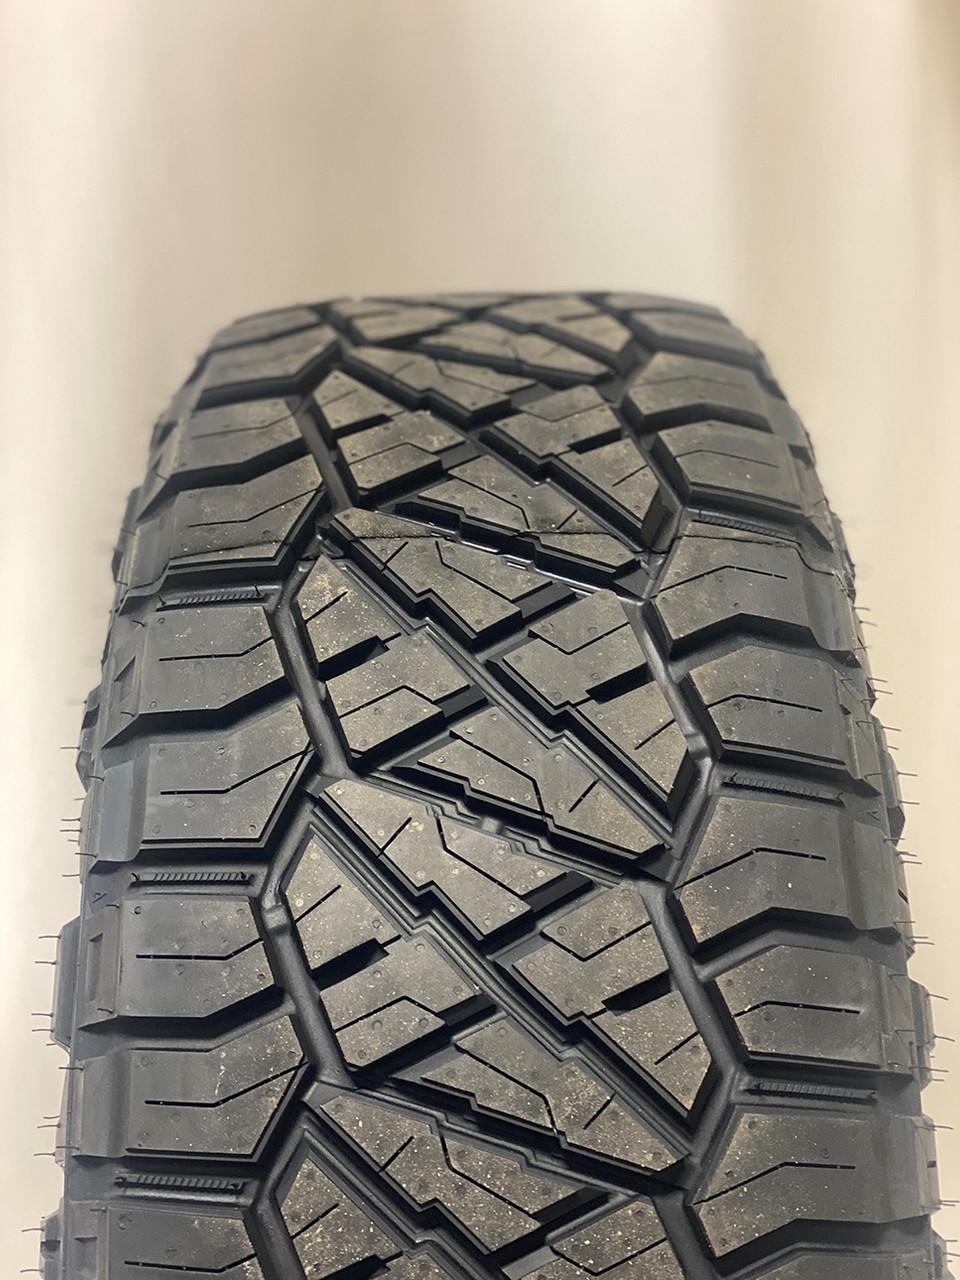 "Black and Machine 20"" RST Style Split Spoke Wheels with Nitto Ridge Grappler Tires for Chevy Silverado, Tahoe, Suburban - New Set of 4"